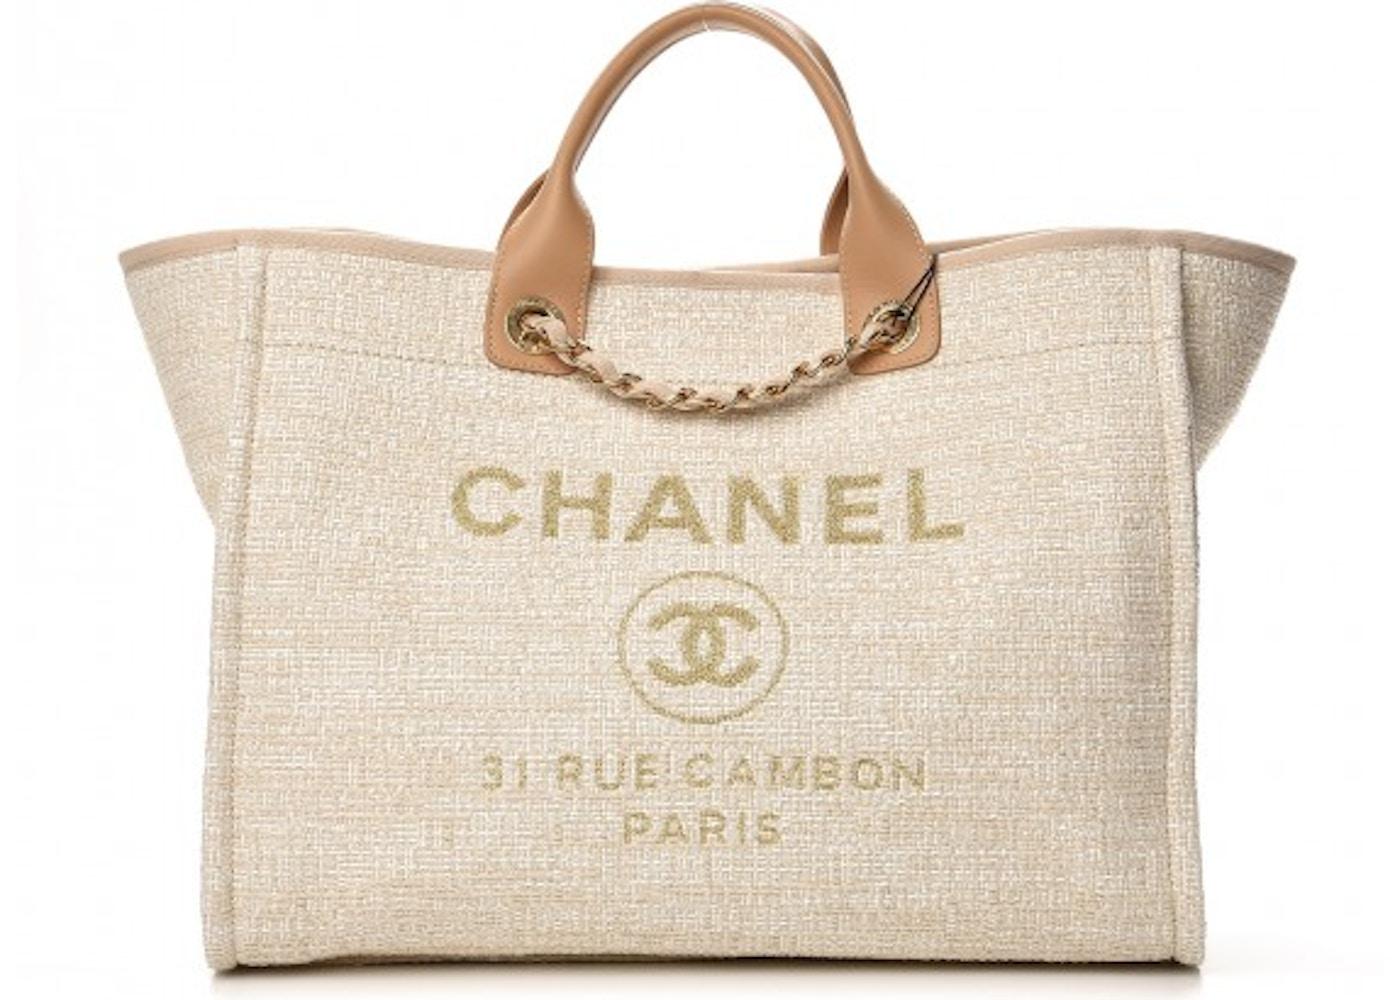 4efd91480277 Buy & Sell Chanel Other Handbags - Highest Bid